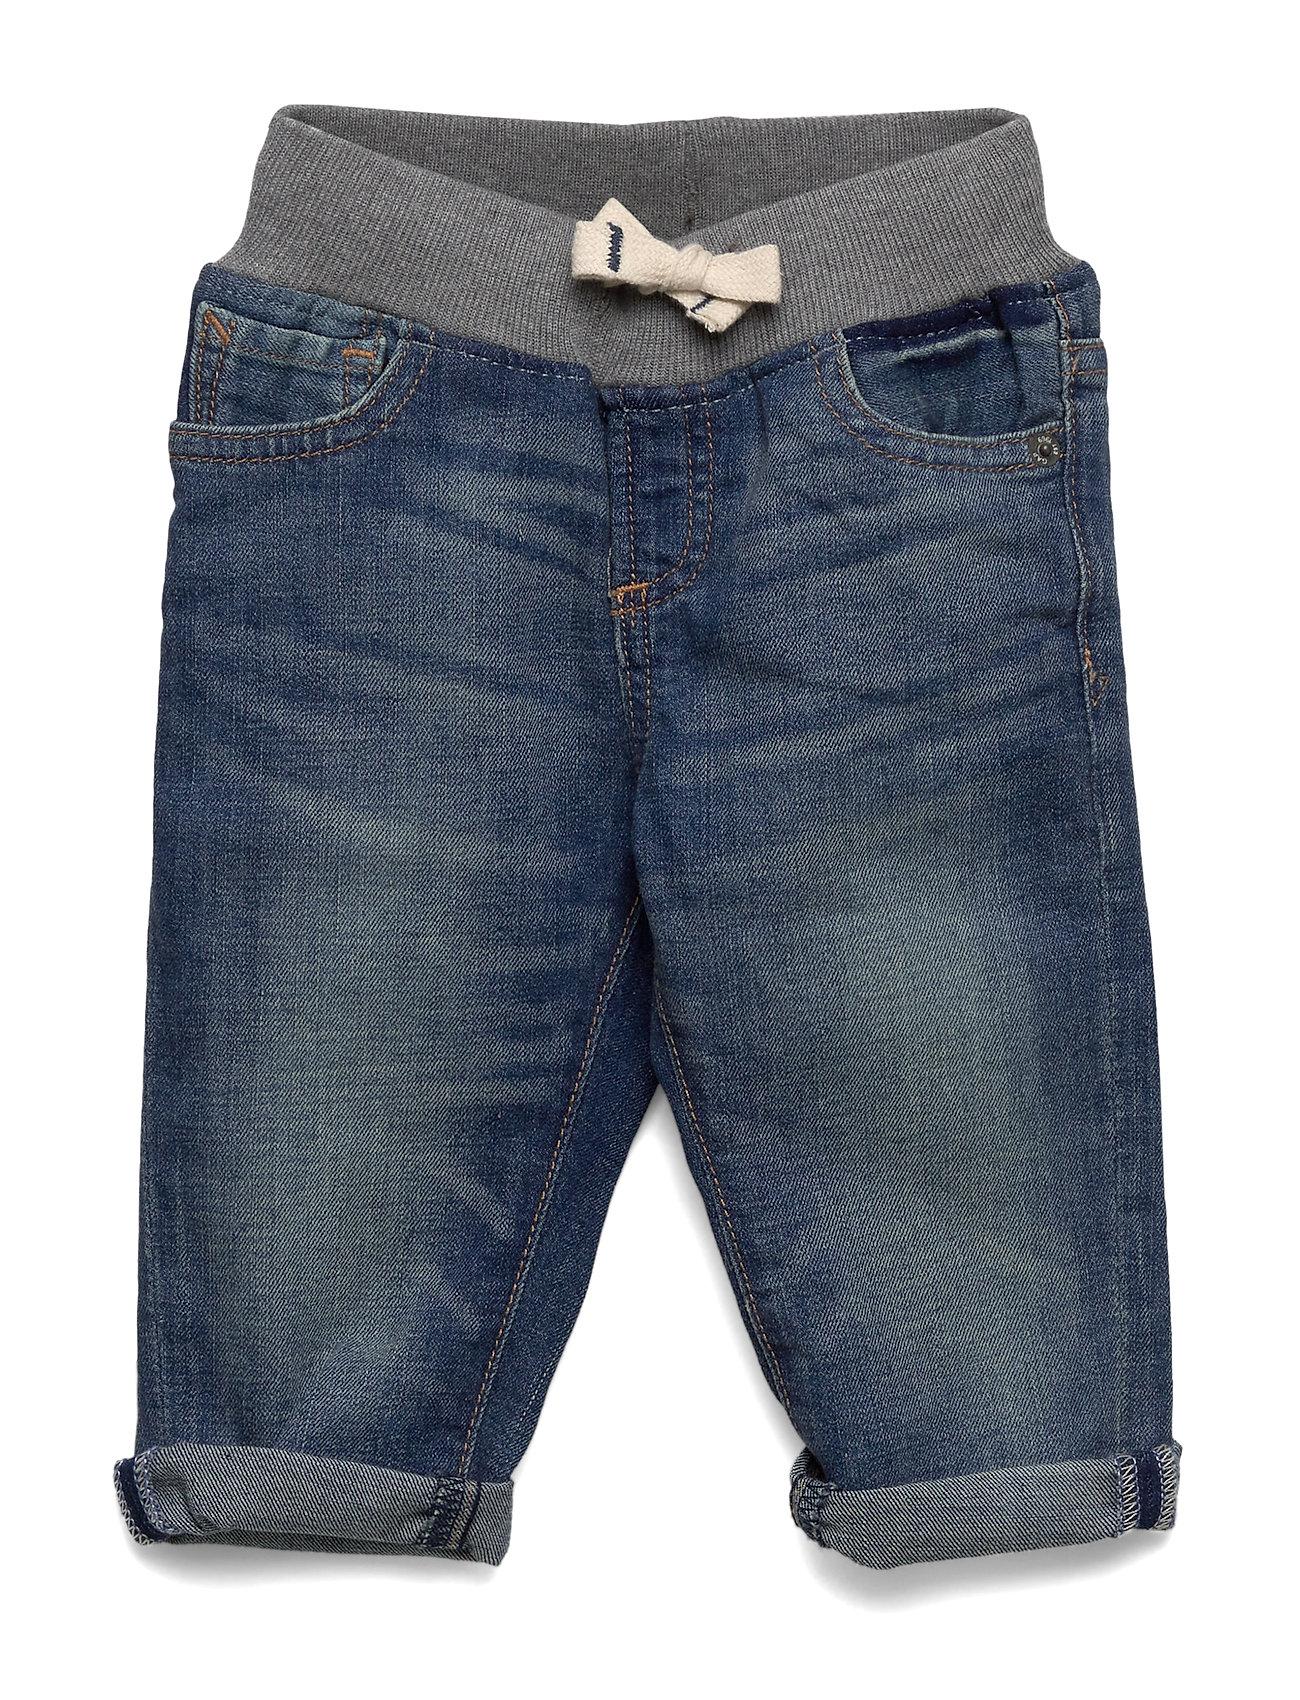 GAP Toddler Slim Jeans with Stretch - MEDIUM WASH